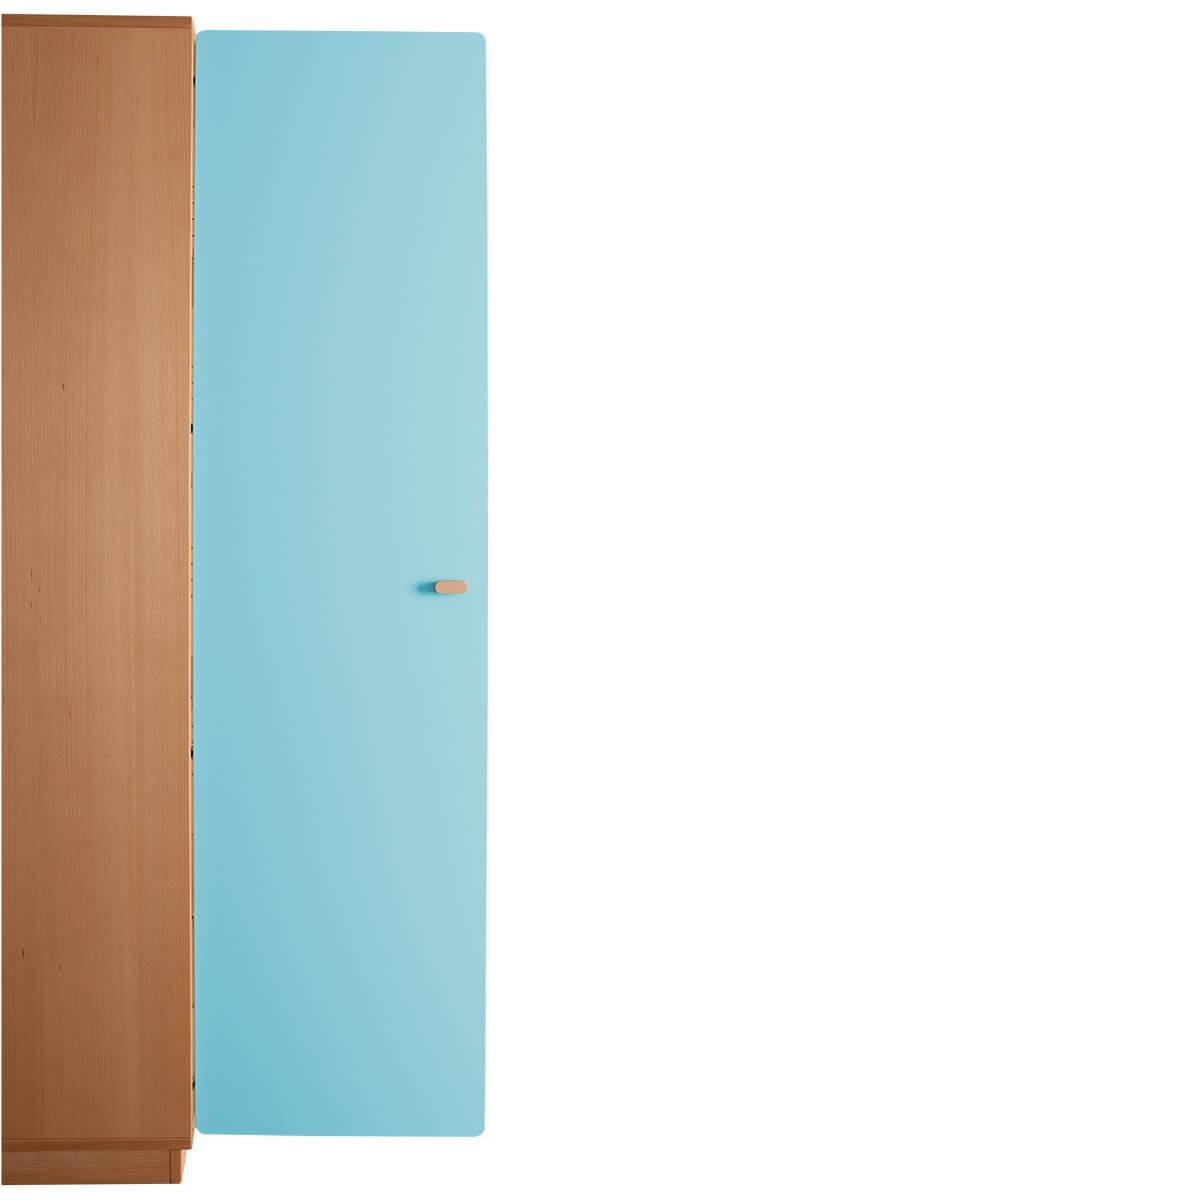 Schranktür 5/5 176cm-Griff DESTYLE de Breuyn MDF kristallblau-lackiert